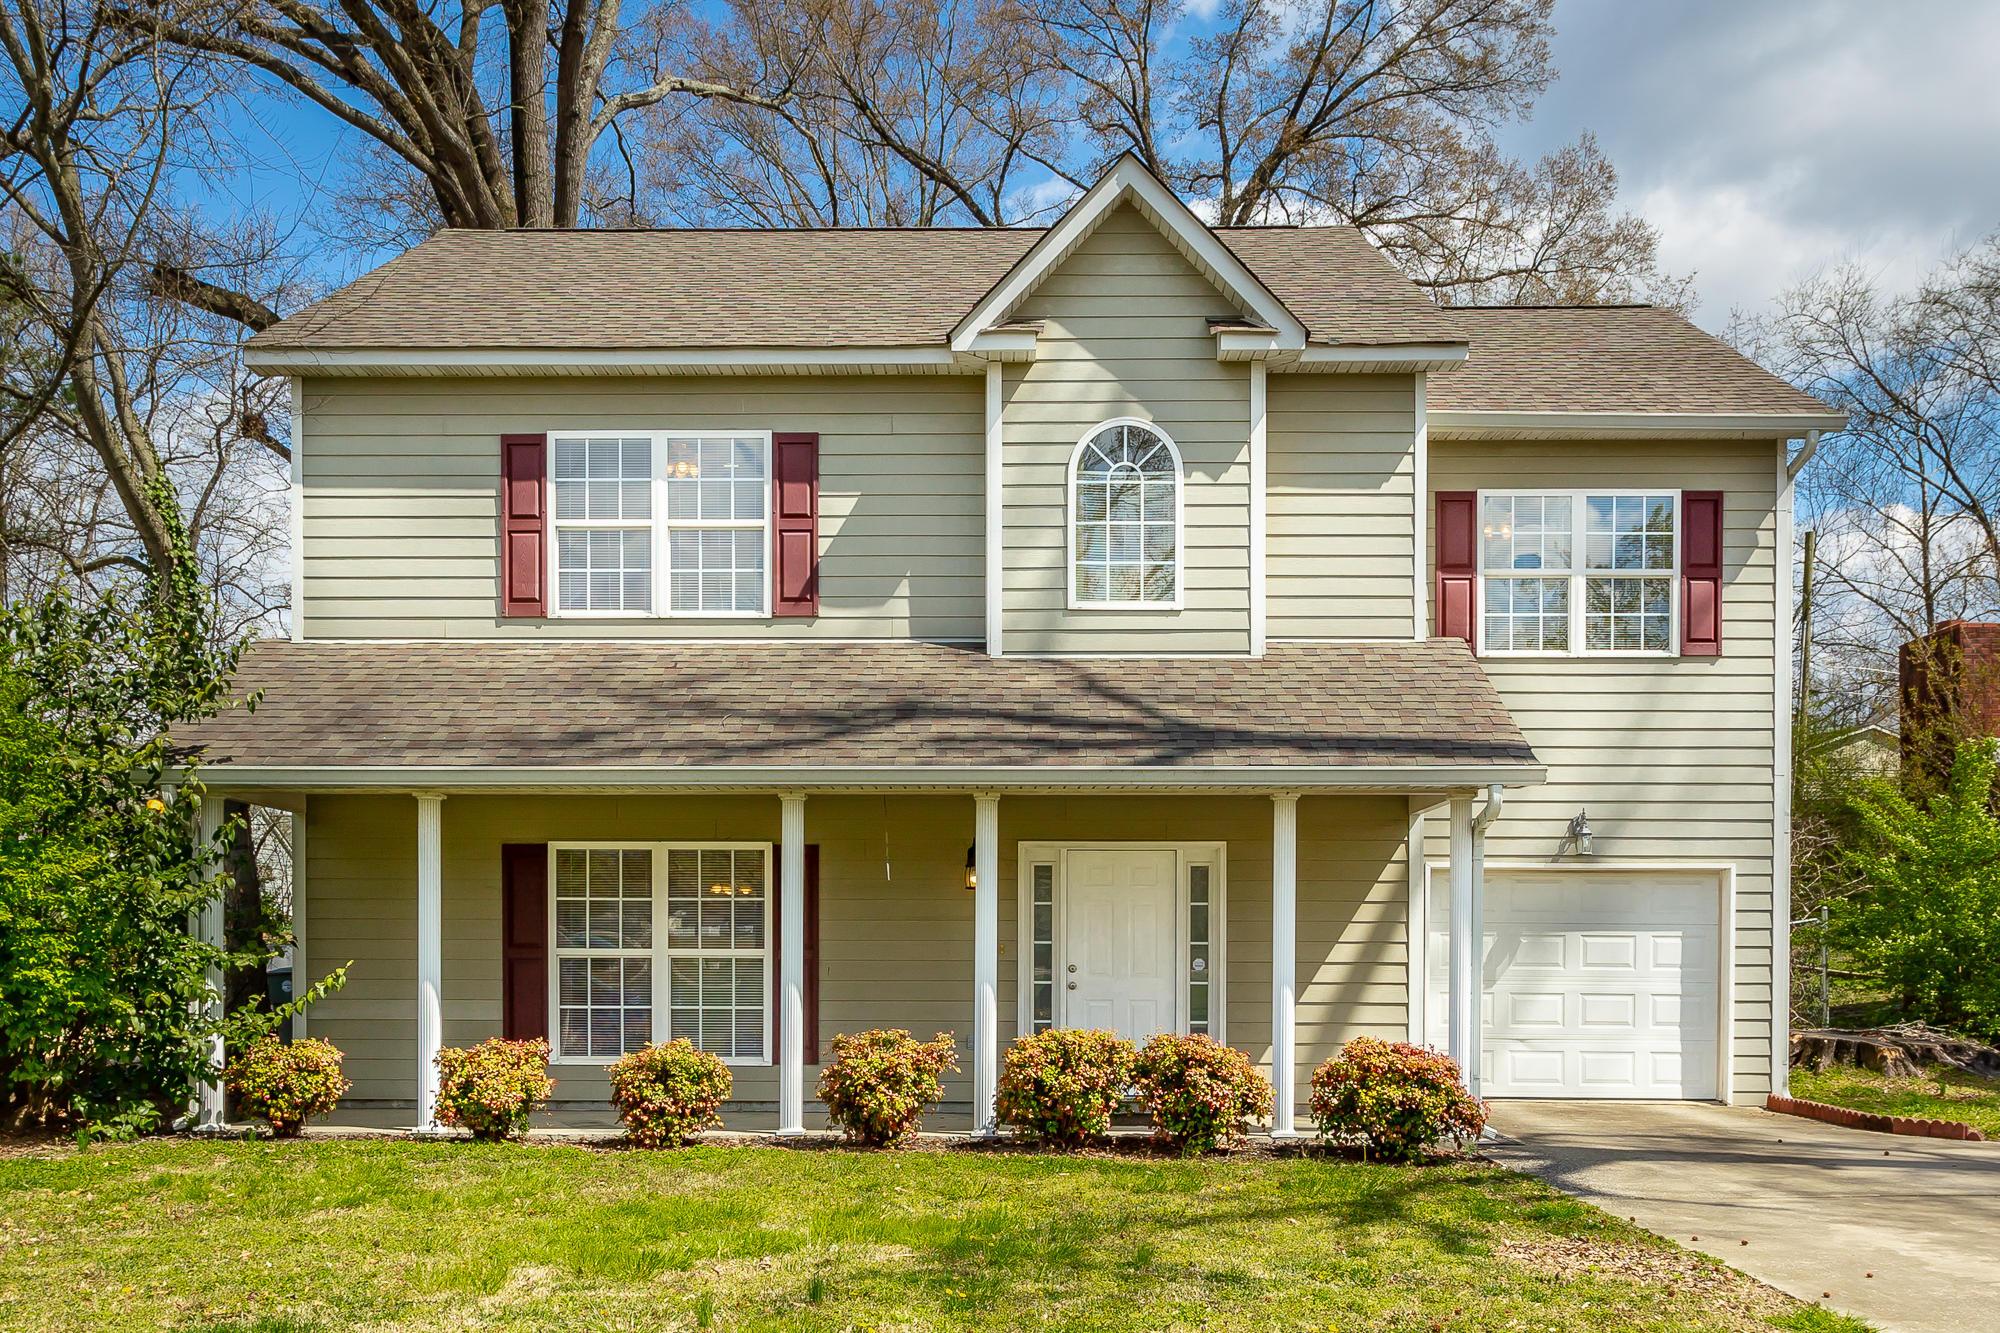 4505  Rockford  Ln, Chattanooga, Tennessee